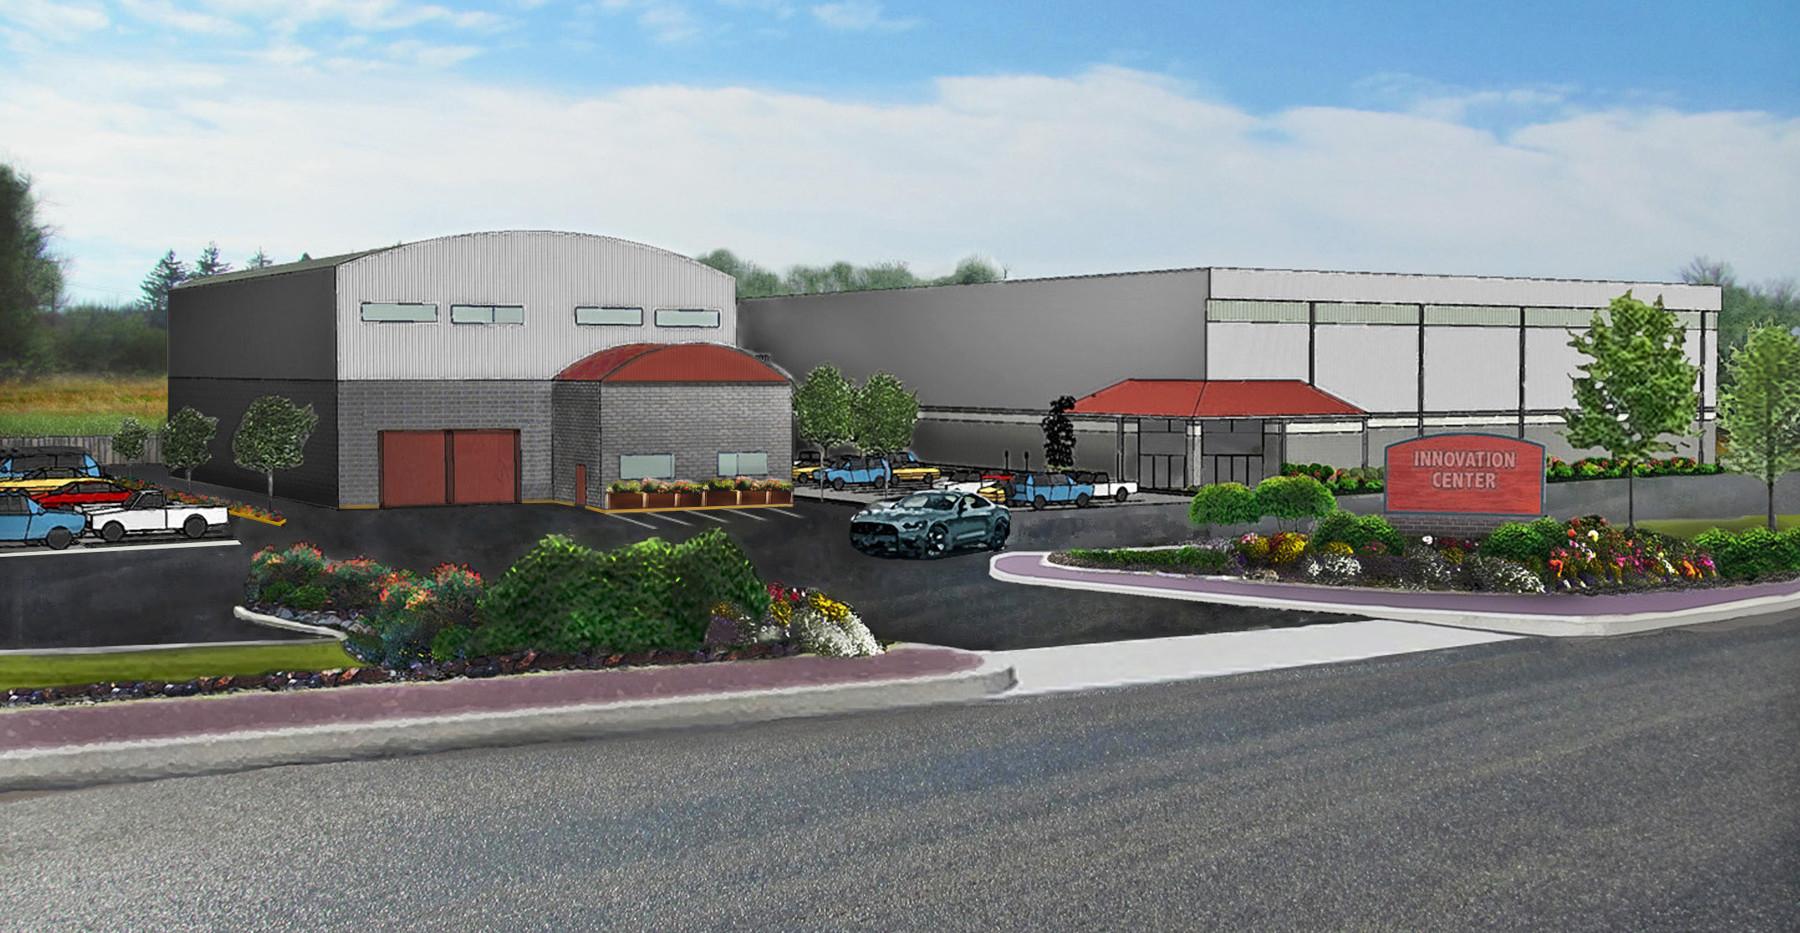 Bridgeton Innovation Center (Proposed)